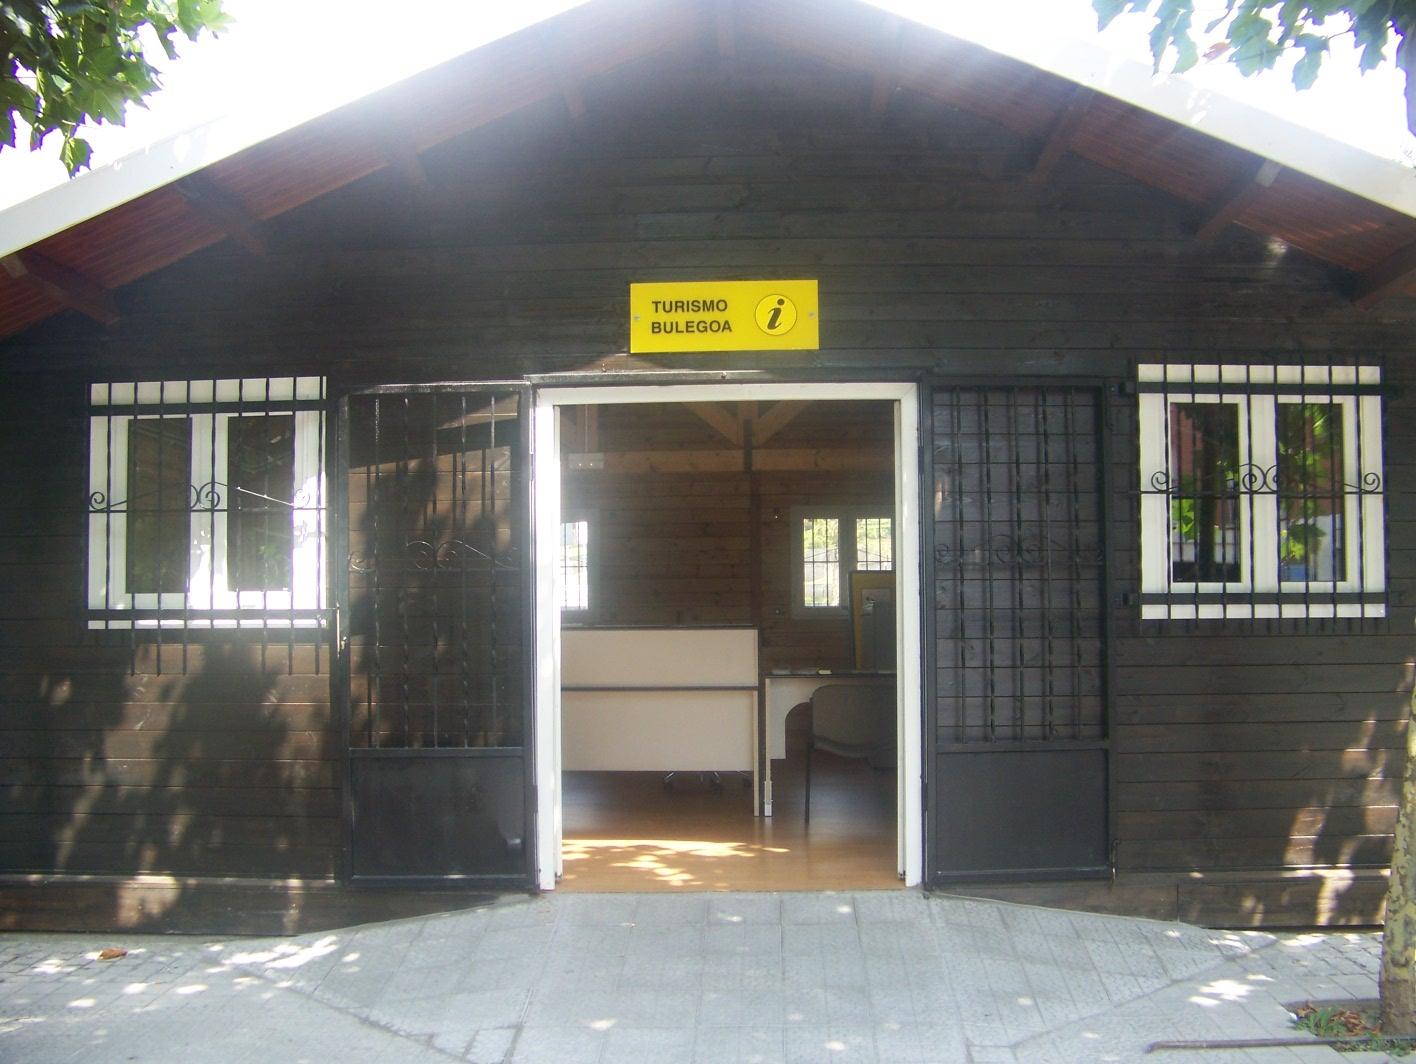 Oficinas de turismo en vizcaya pa s vasco for Oficina de turismo ibiza